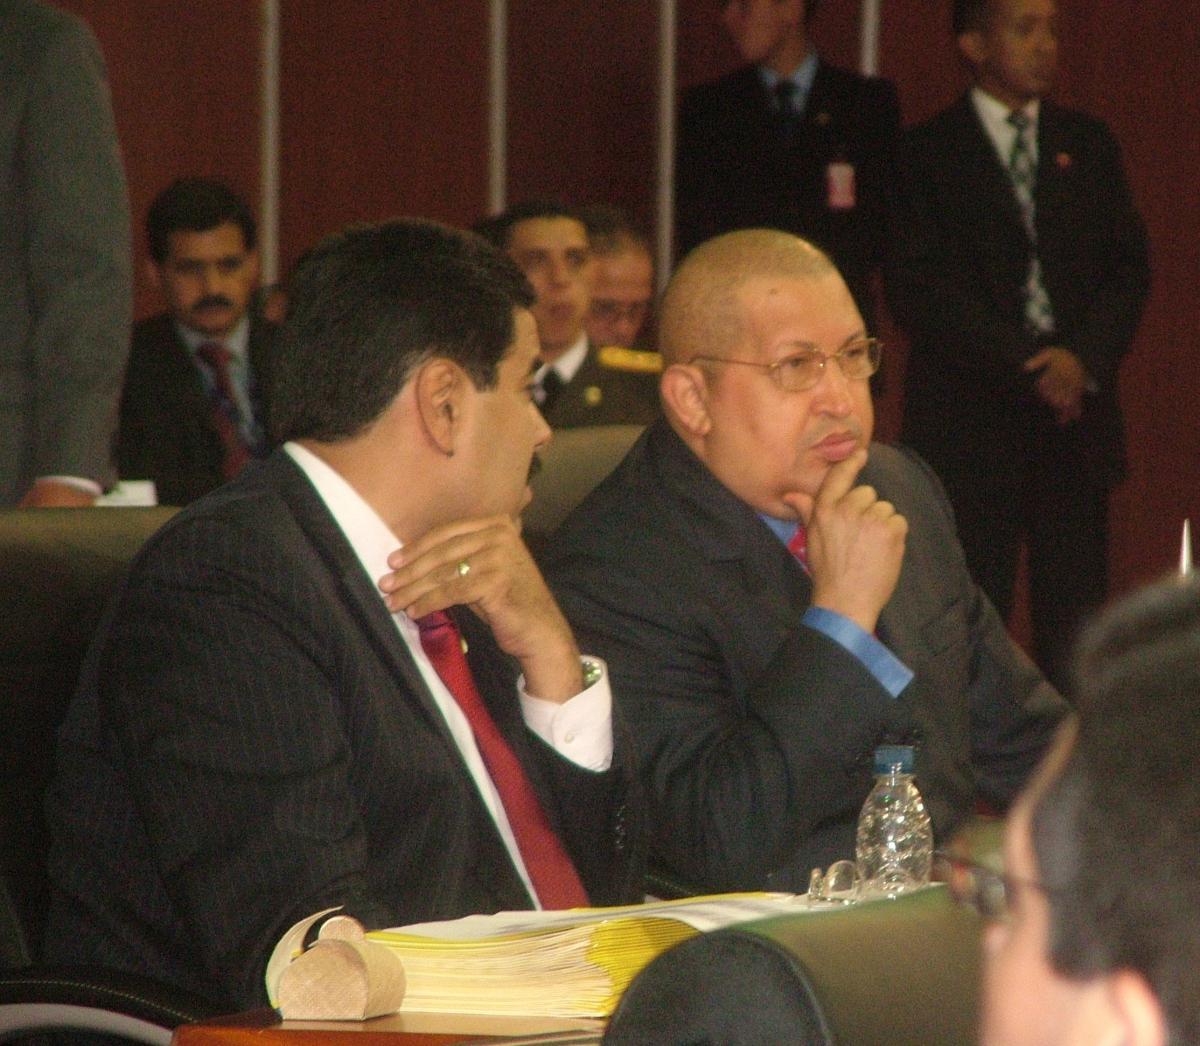 Venezuelan foreign minister Nicolas Maduro (left) with President Hugo Chavez, at the plenary session of the summit on Friday  (Tamara Pearson / Venezuelanalysis.com)